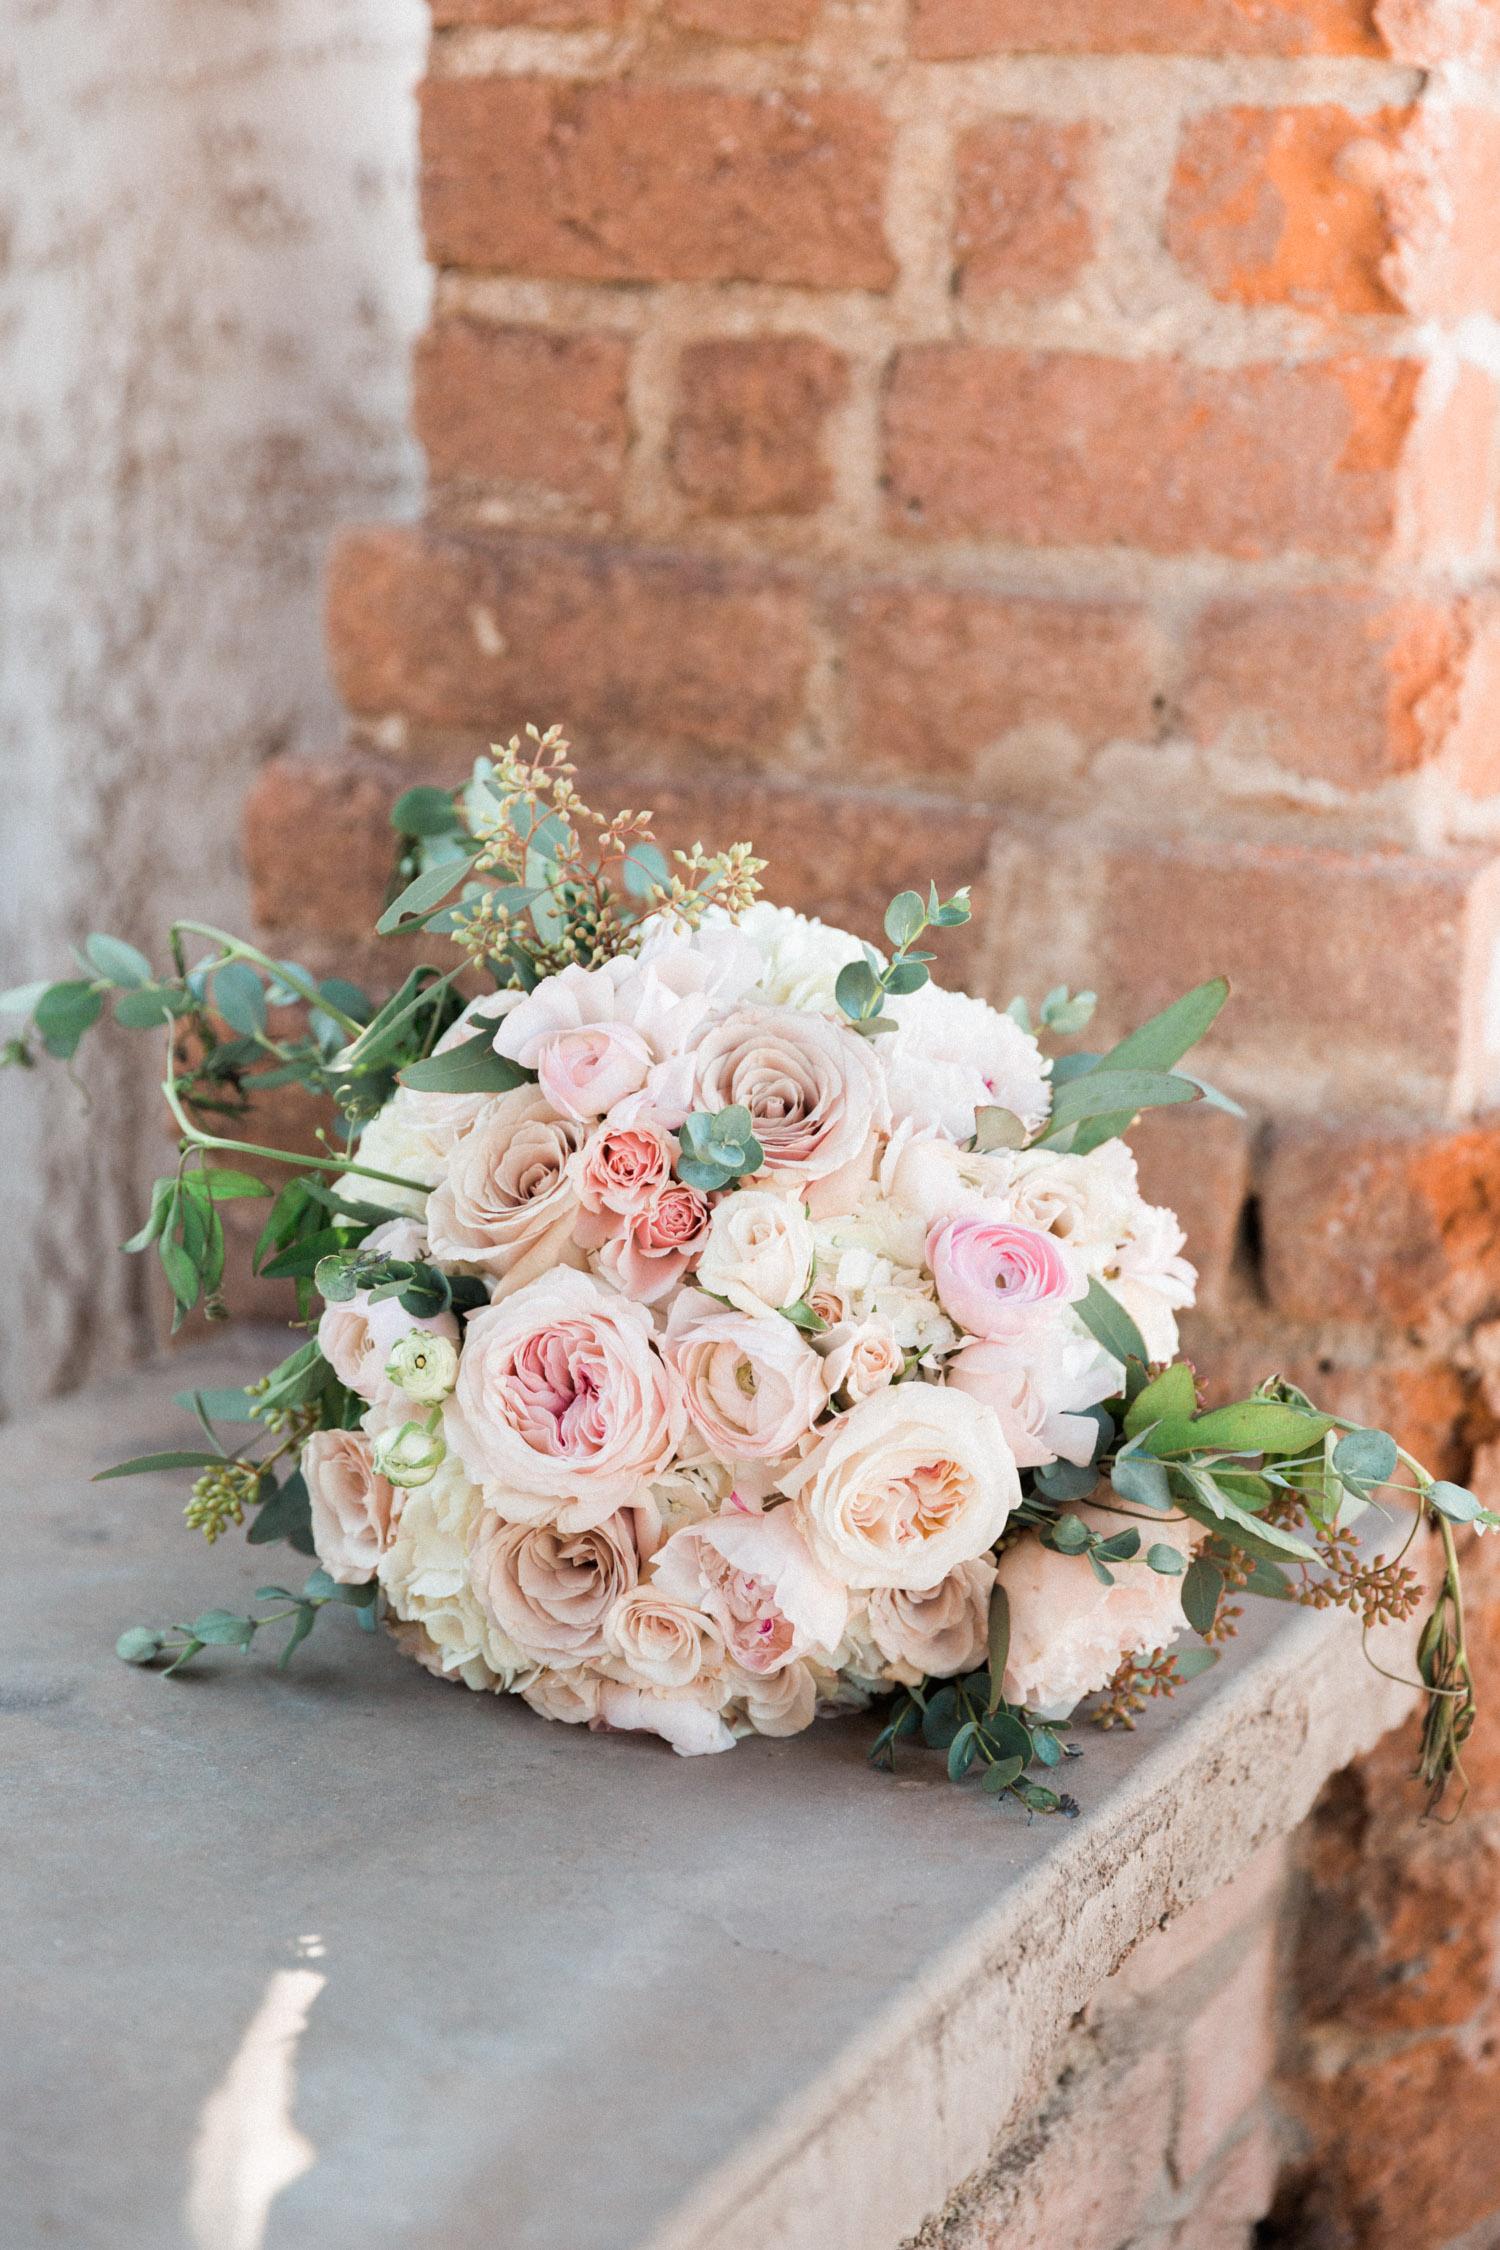 Beautiful blush bridal bouquet by Posh Petals based out of Tucson | Betsy & John Photography | Tucson Wedding Photographers